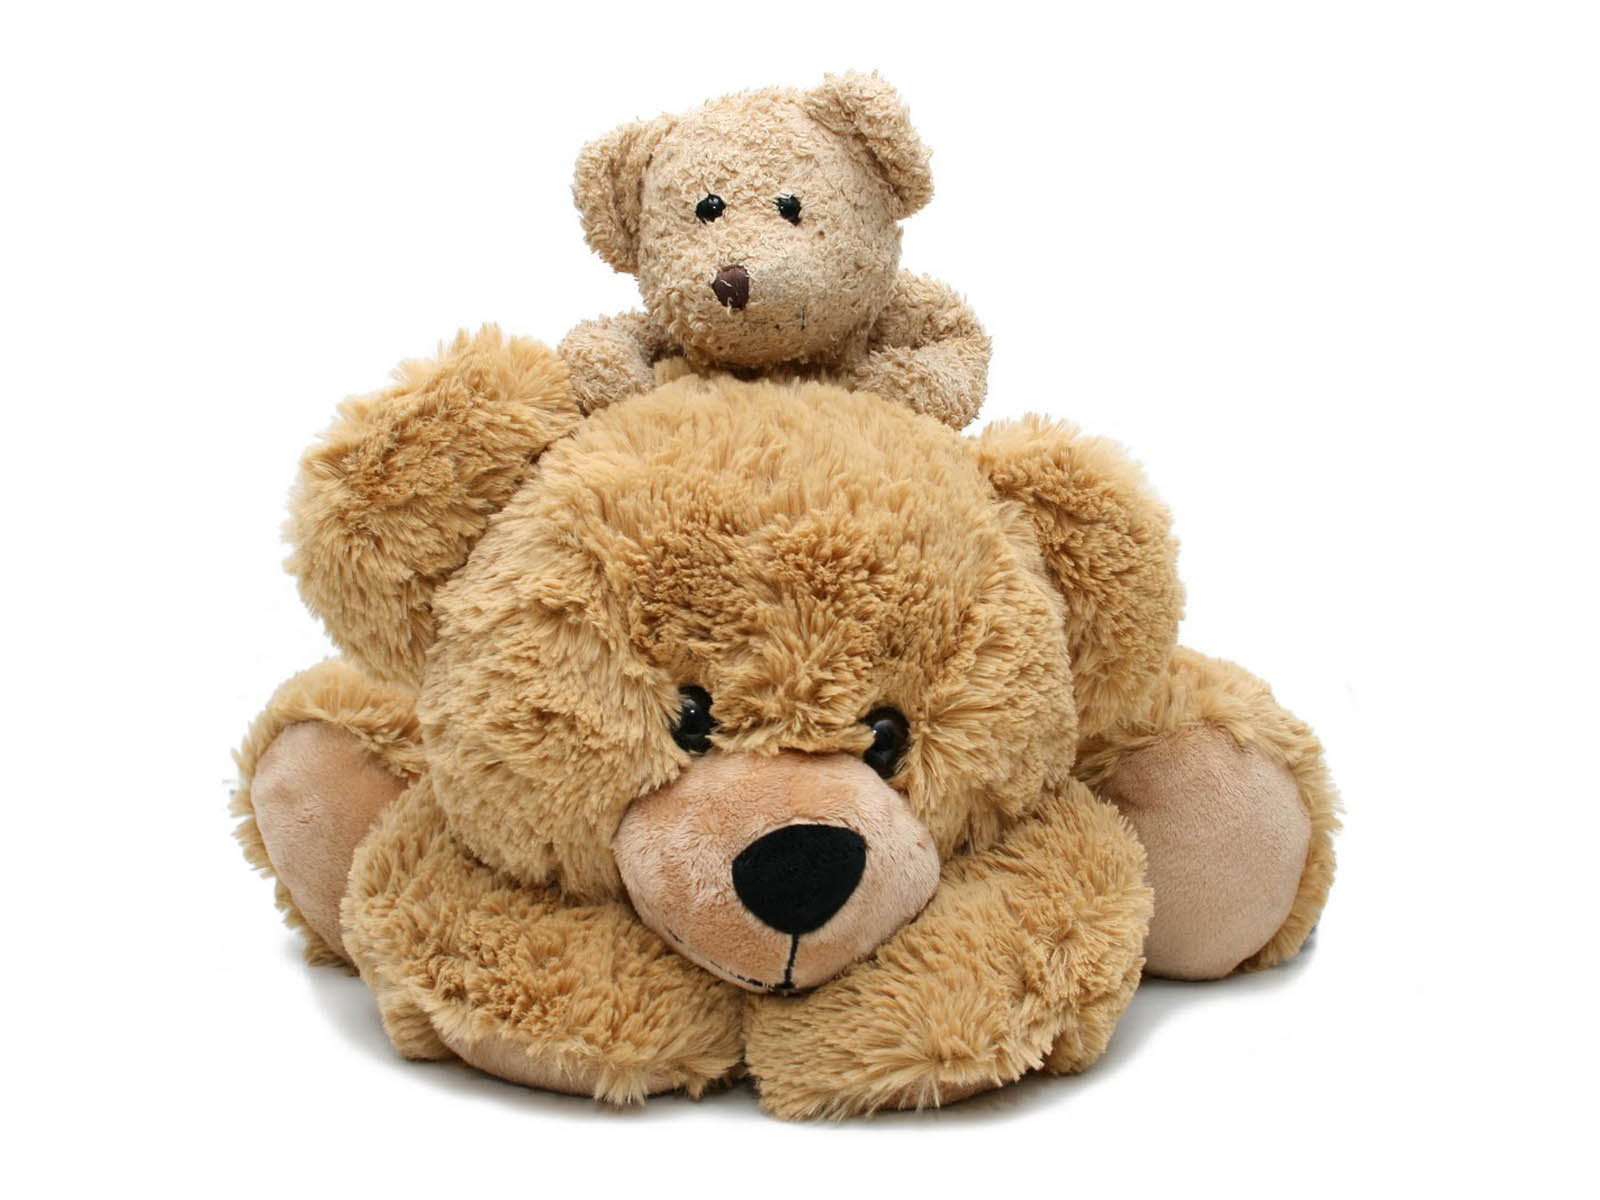 Teddy bear wallpapers for desktop wallpapersafari - Free teddy bear pics ...